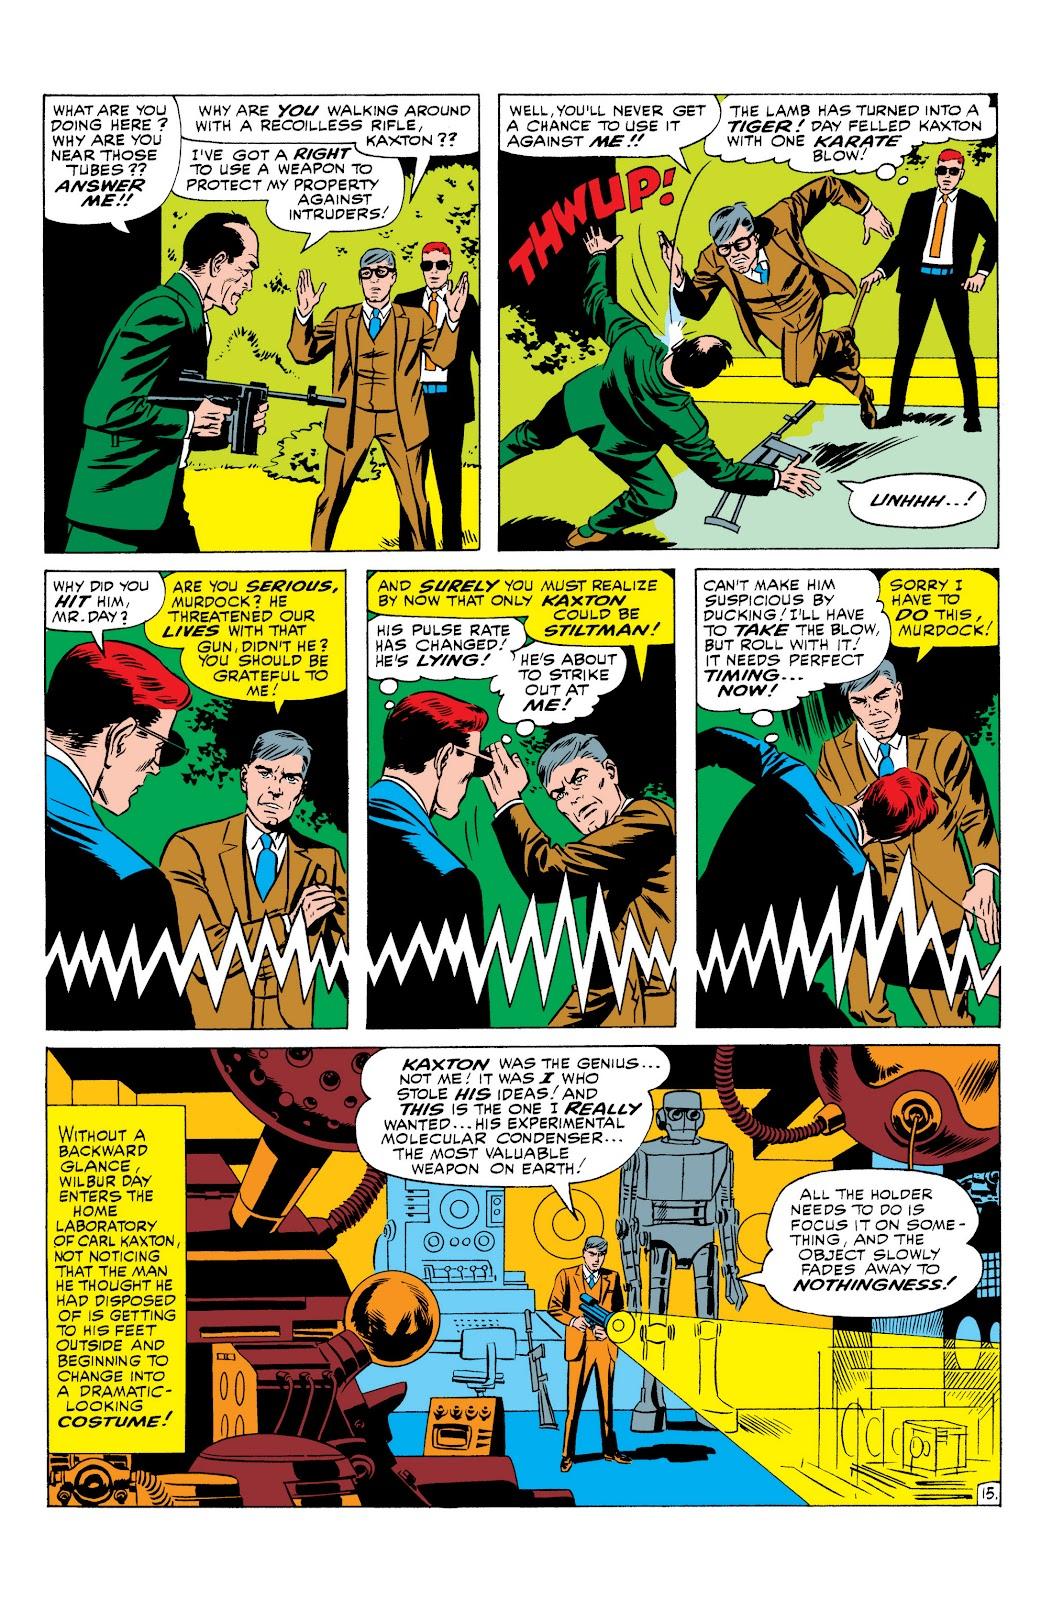 Read online Marvel Masterworks: Daredevil comic - Issue # TPB 1 (Part 2) - 79